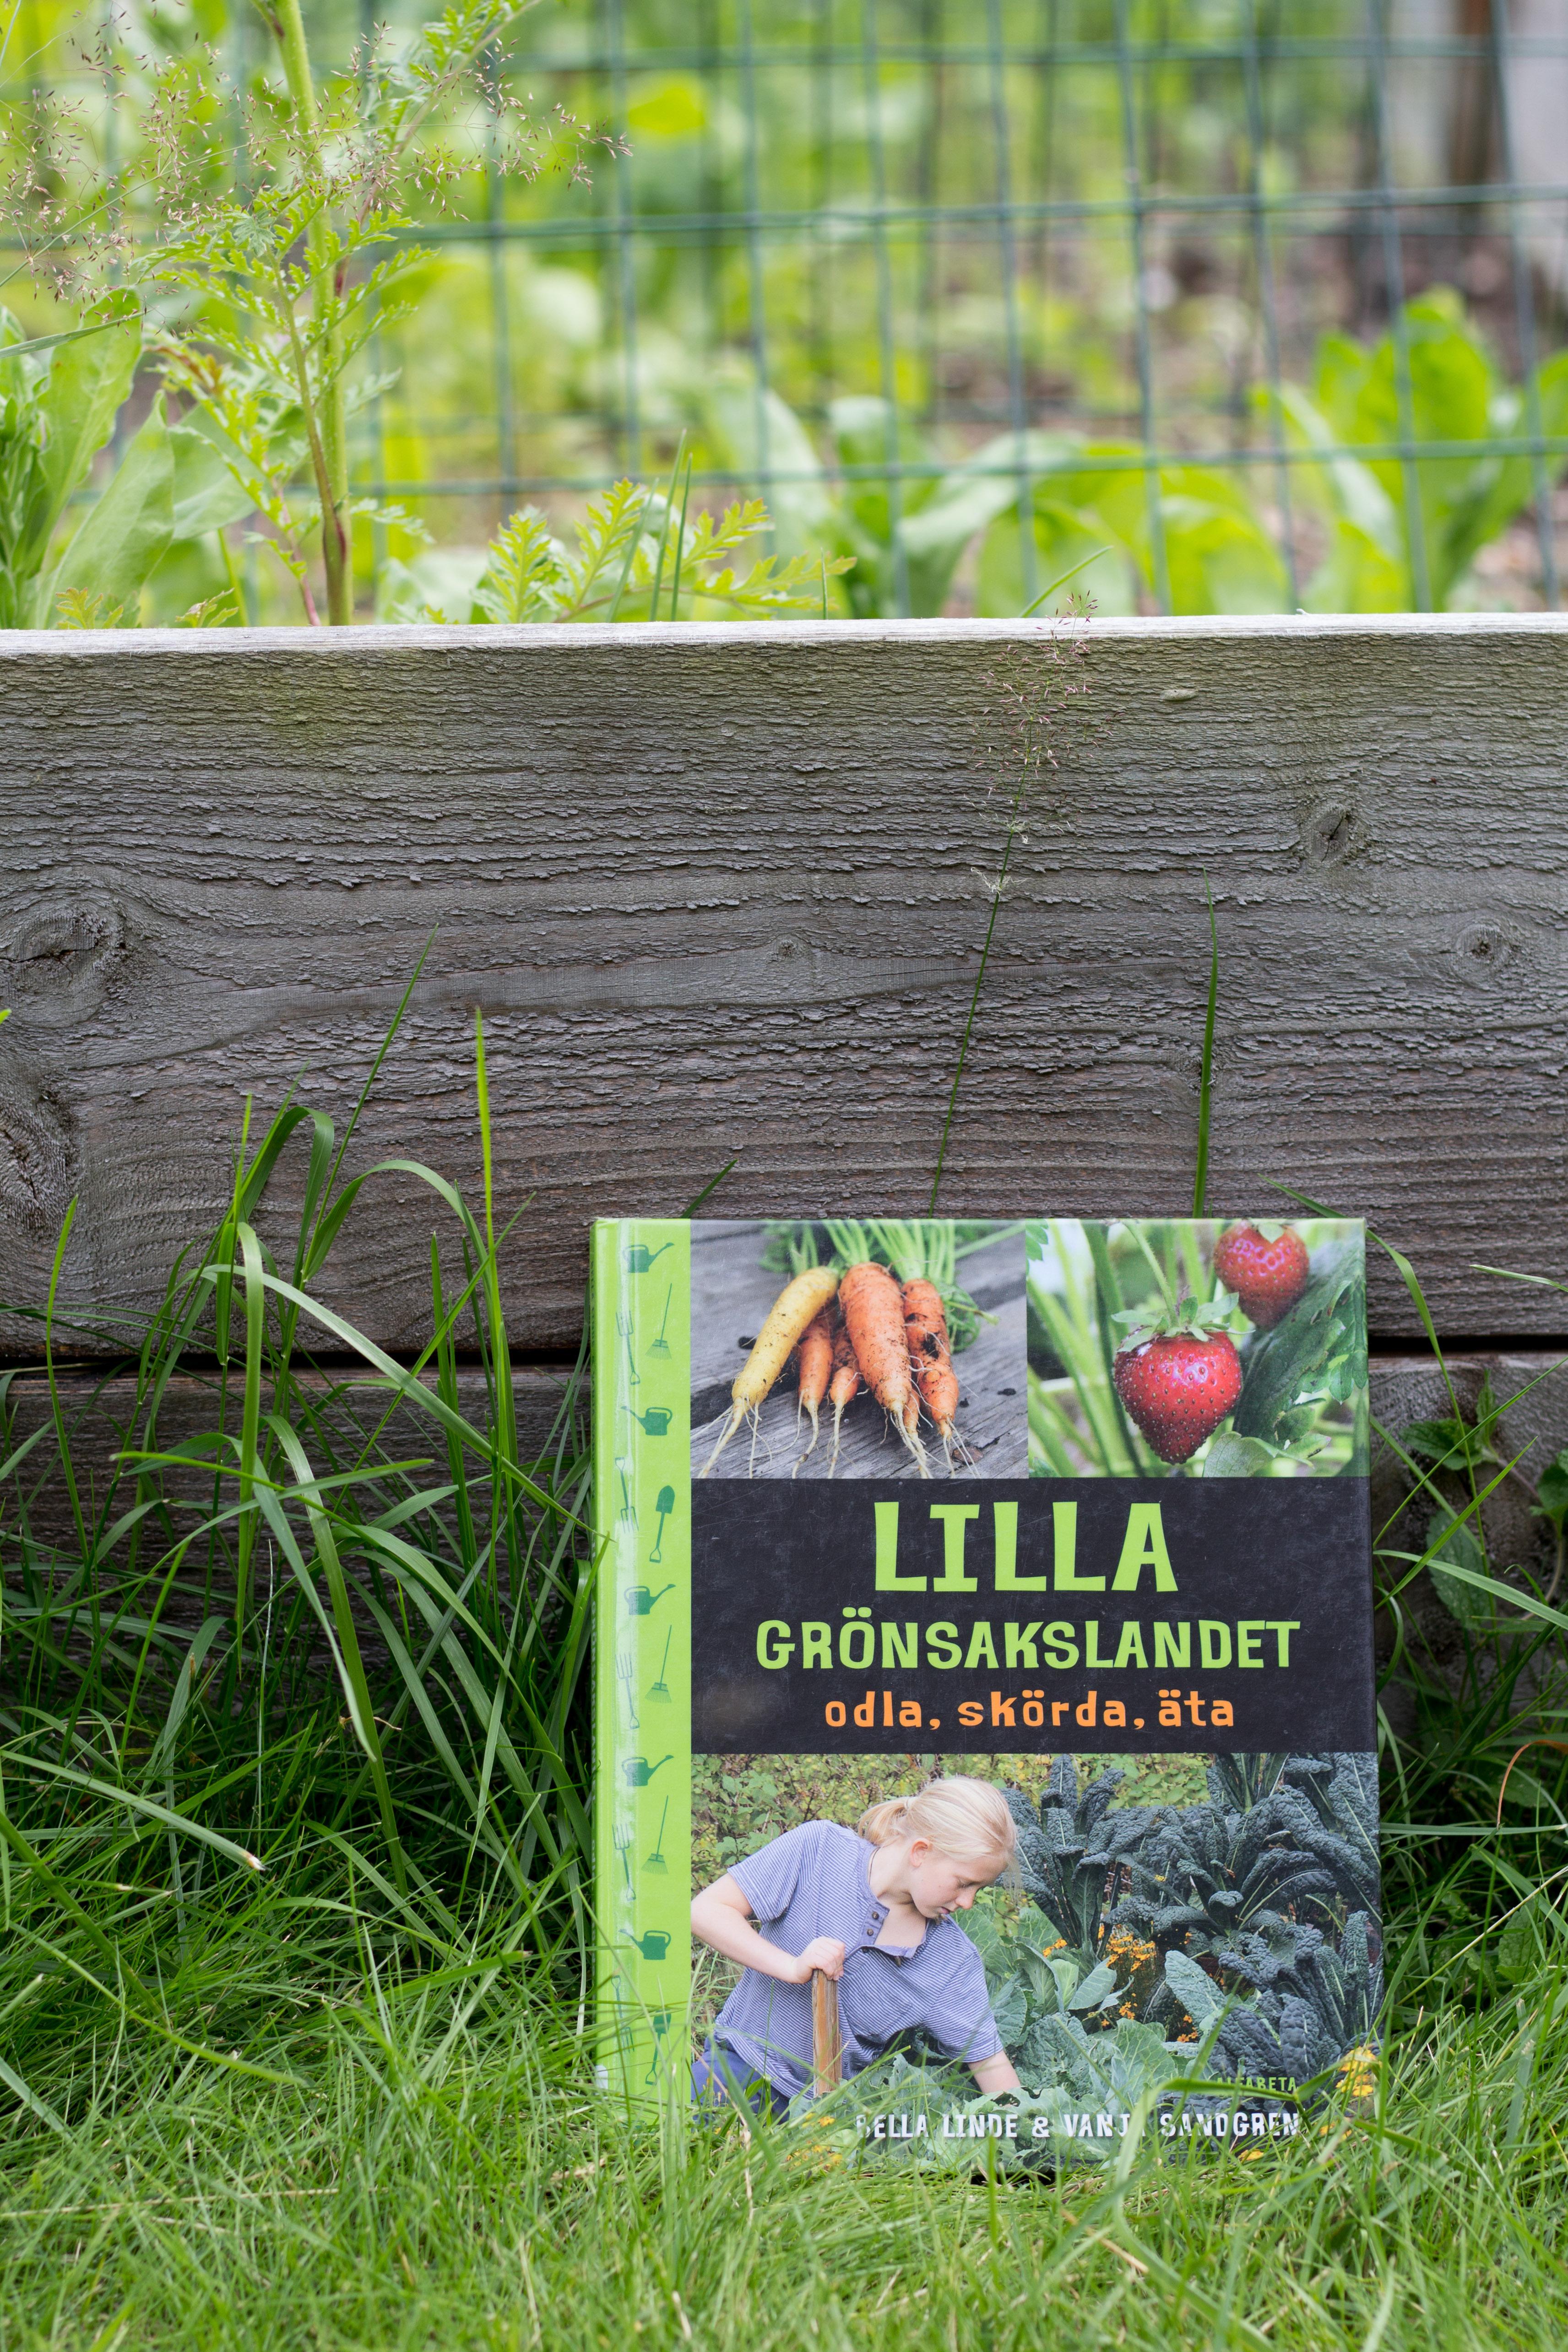 Boken lilla grönsakslandet stående mot en odlingslåda